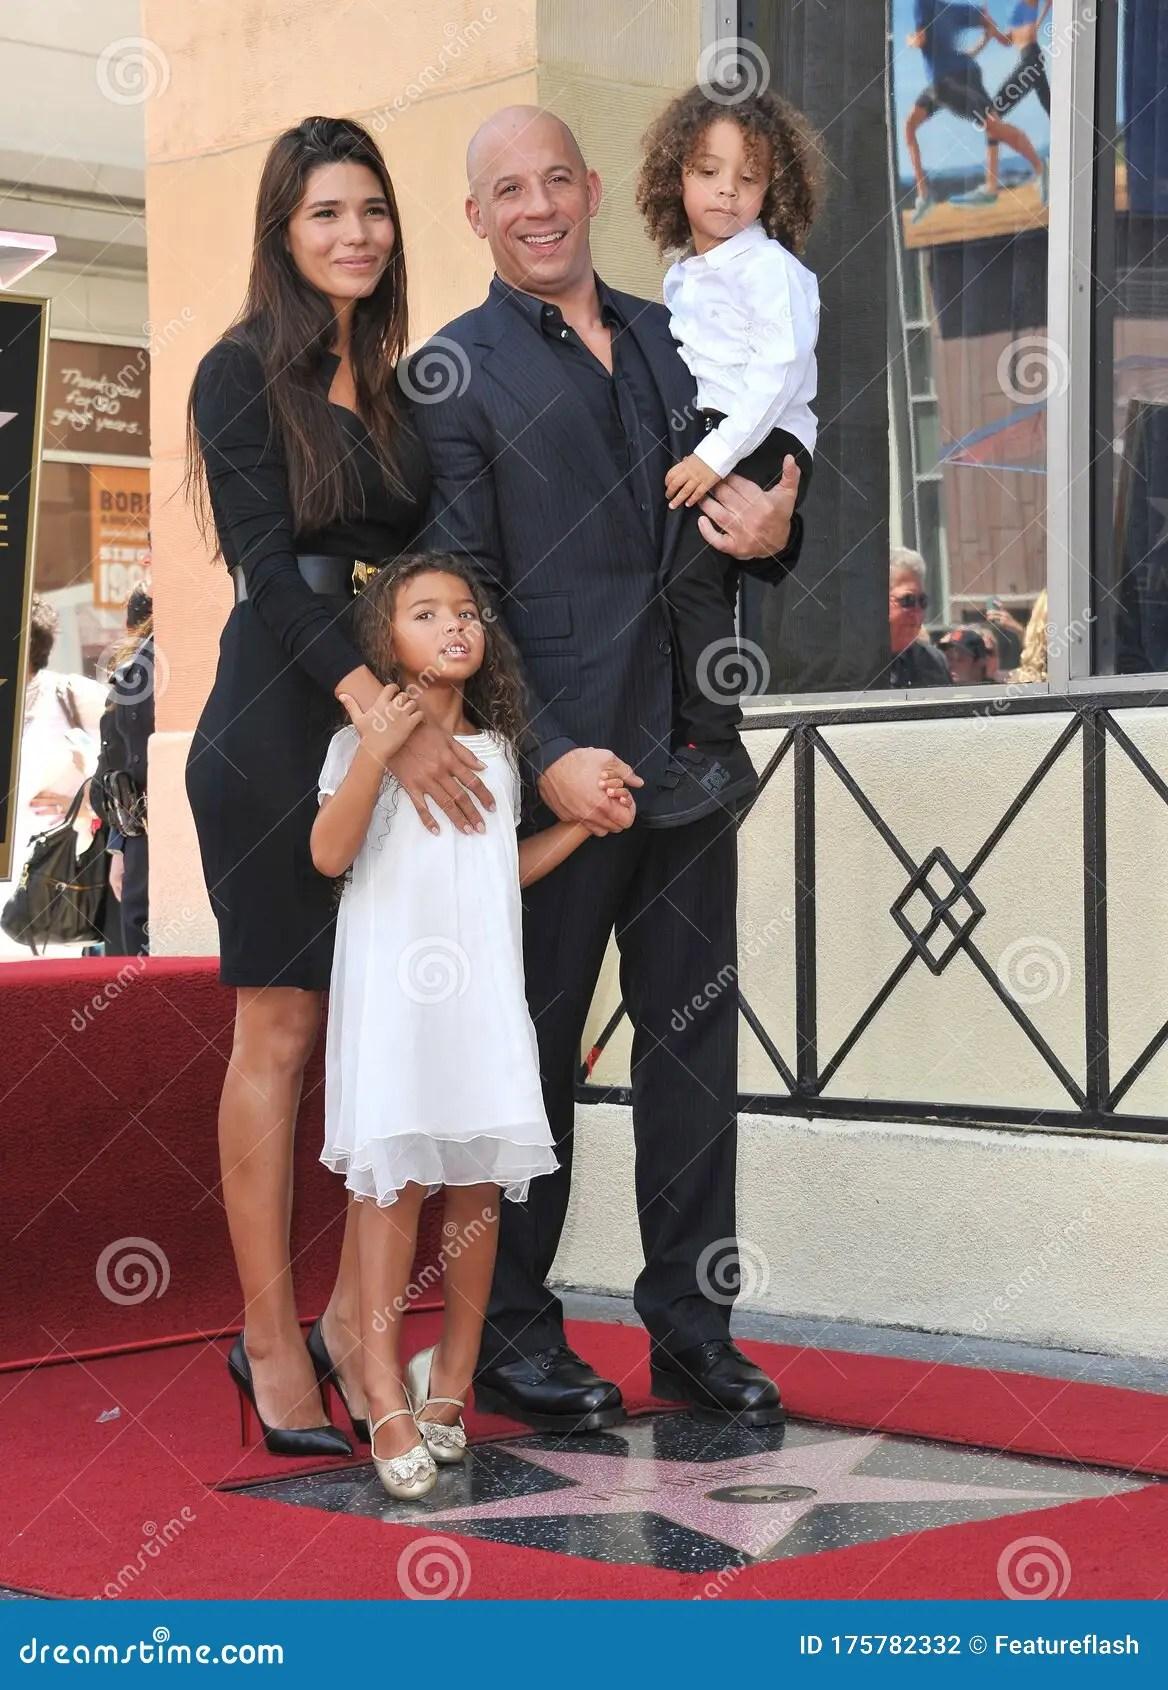 pics Vin Diesel Family dreamstime com